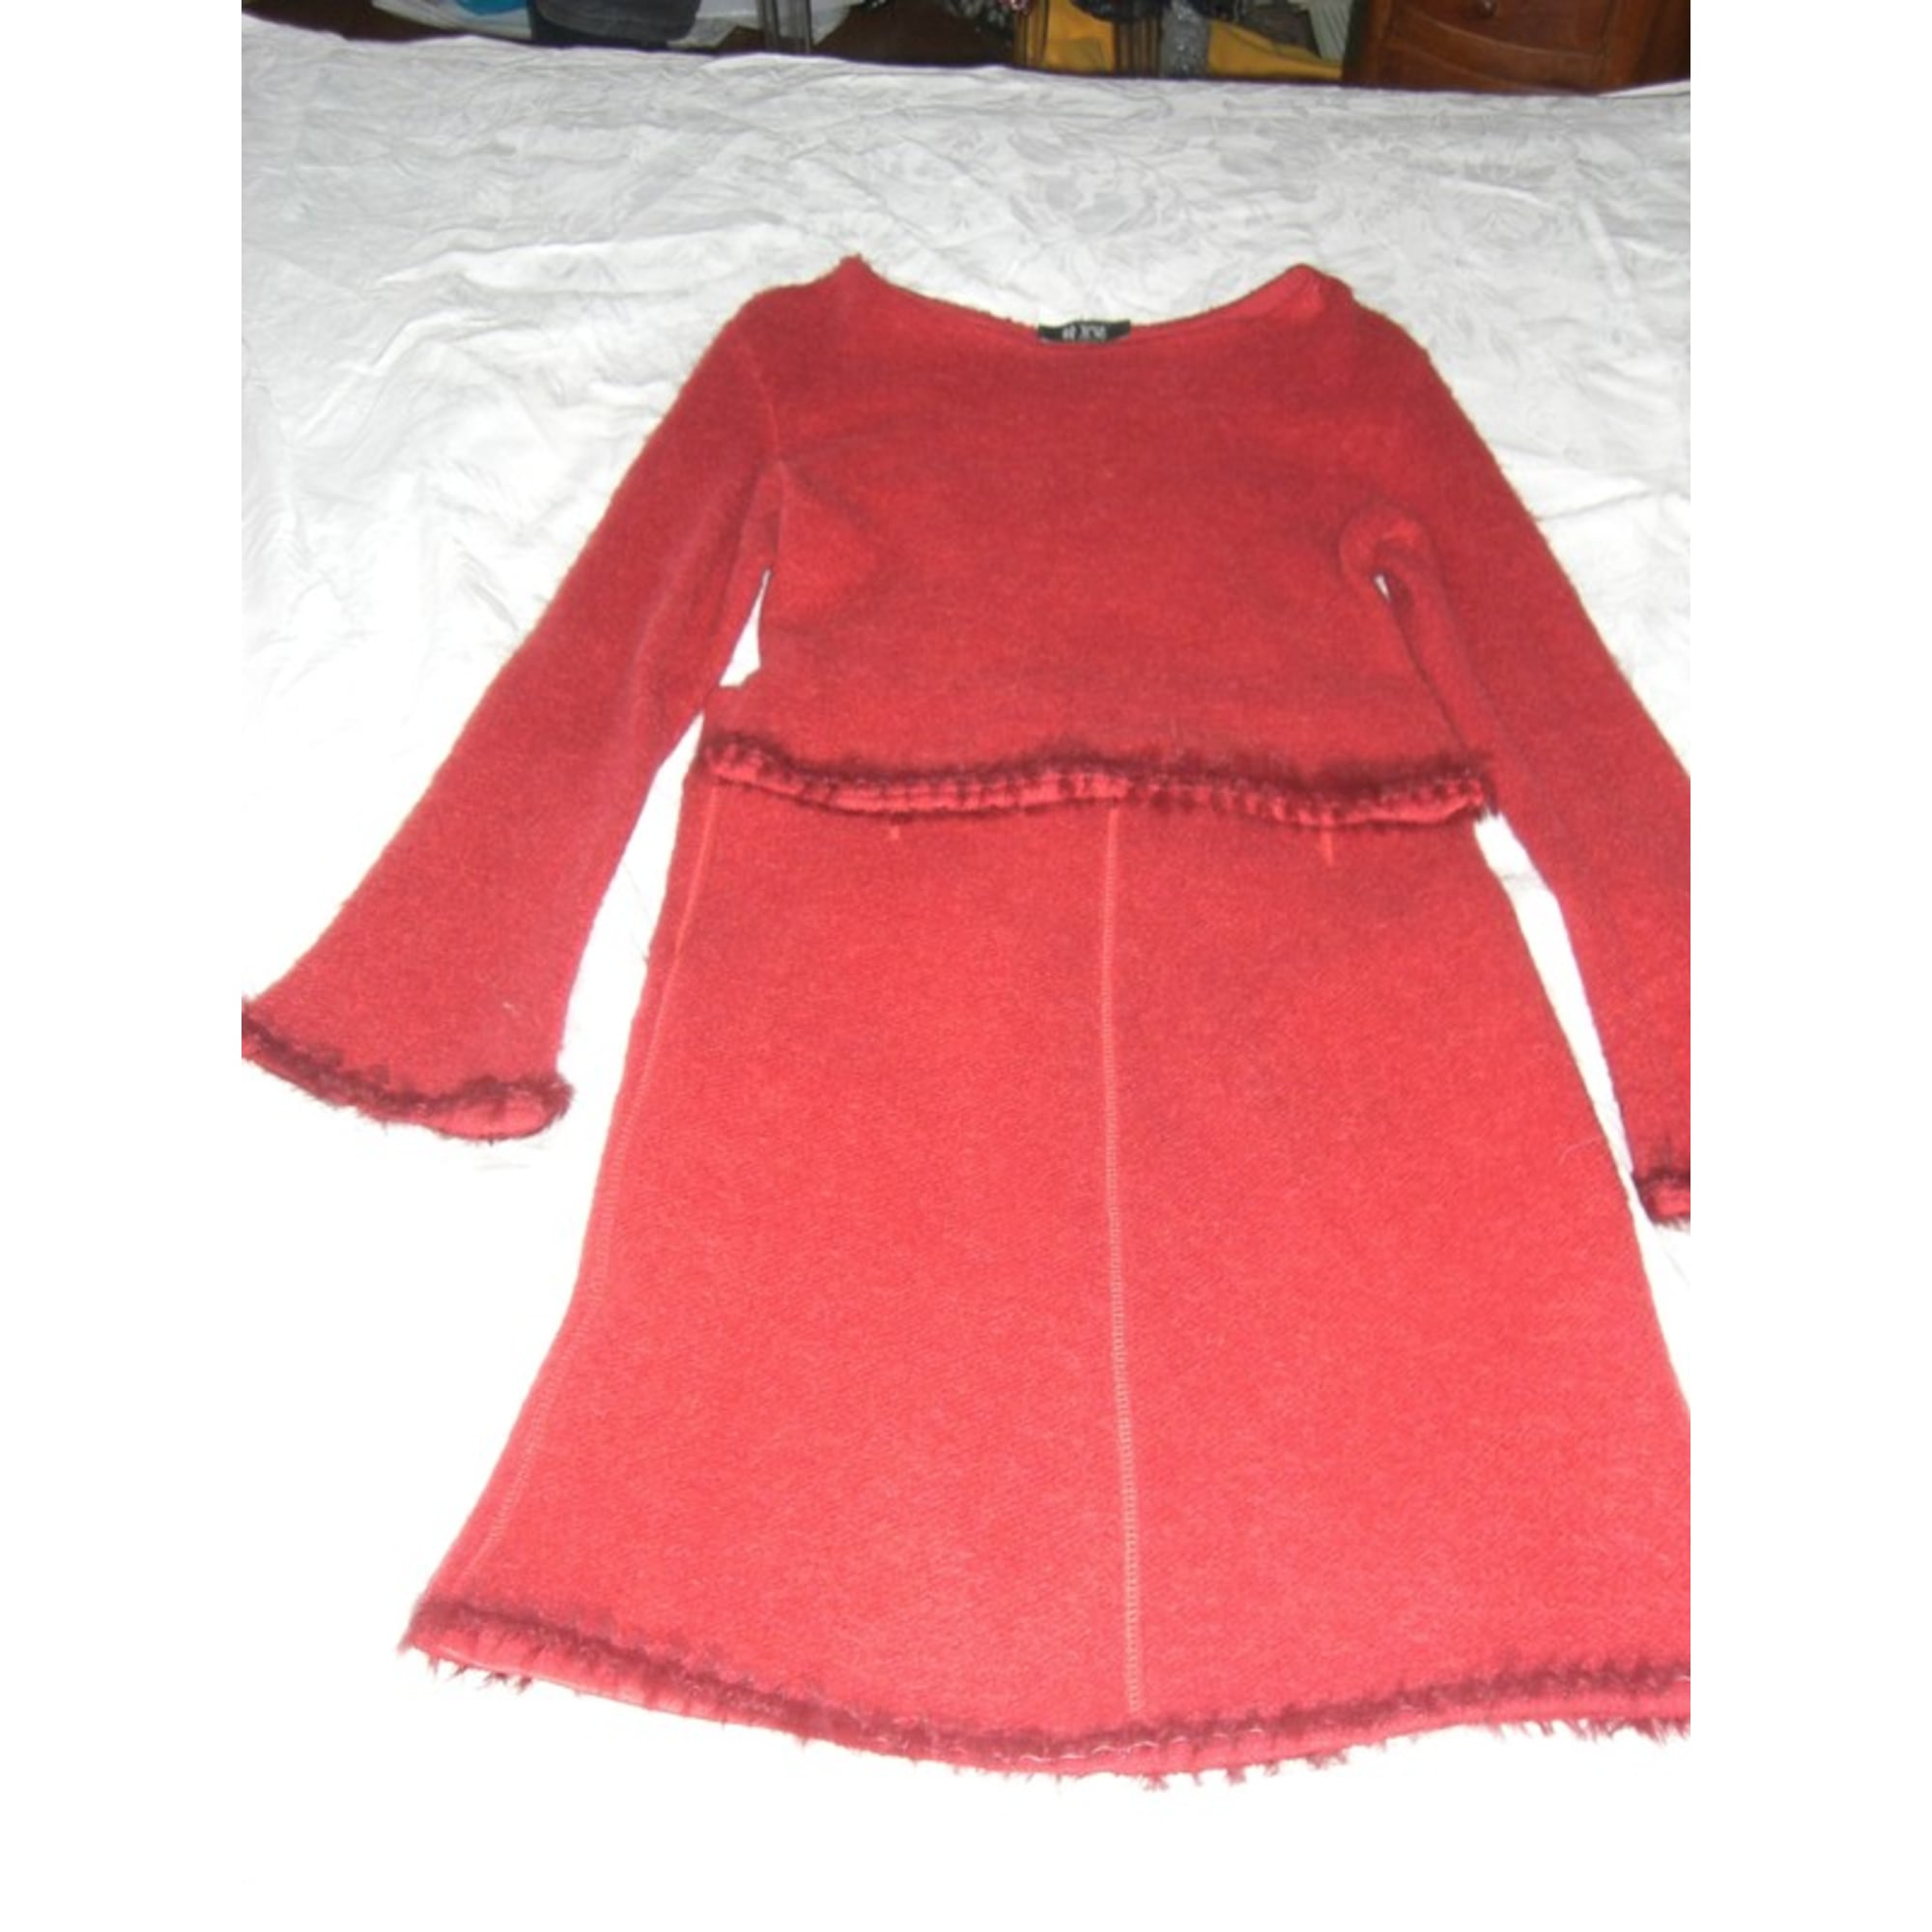 Tailleur jupe KRISTINA POPOVITCH Rouge, bordeaux